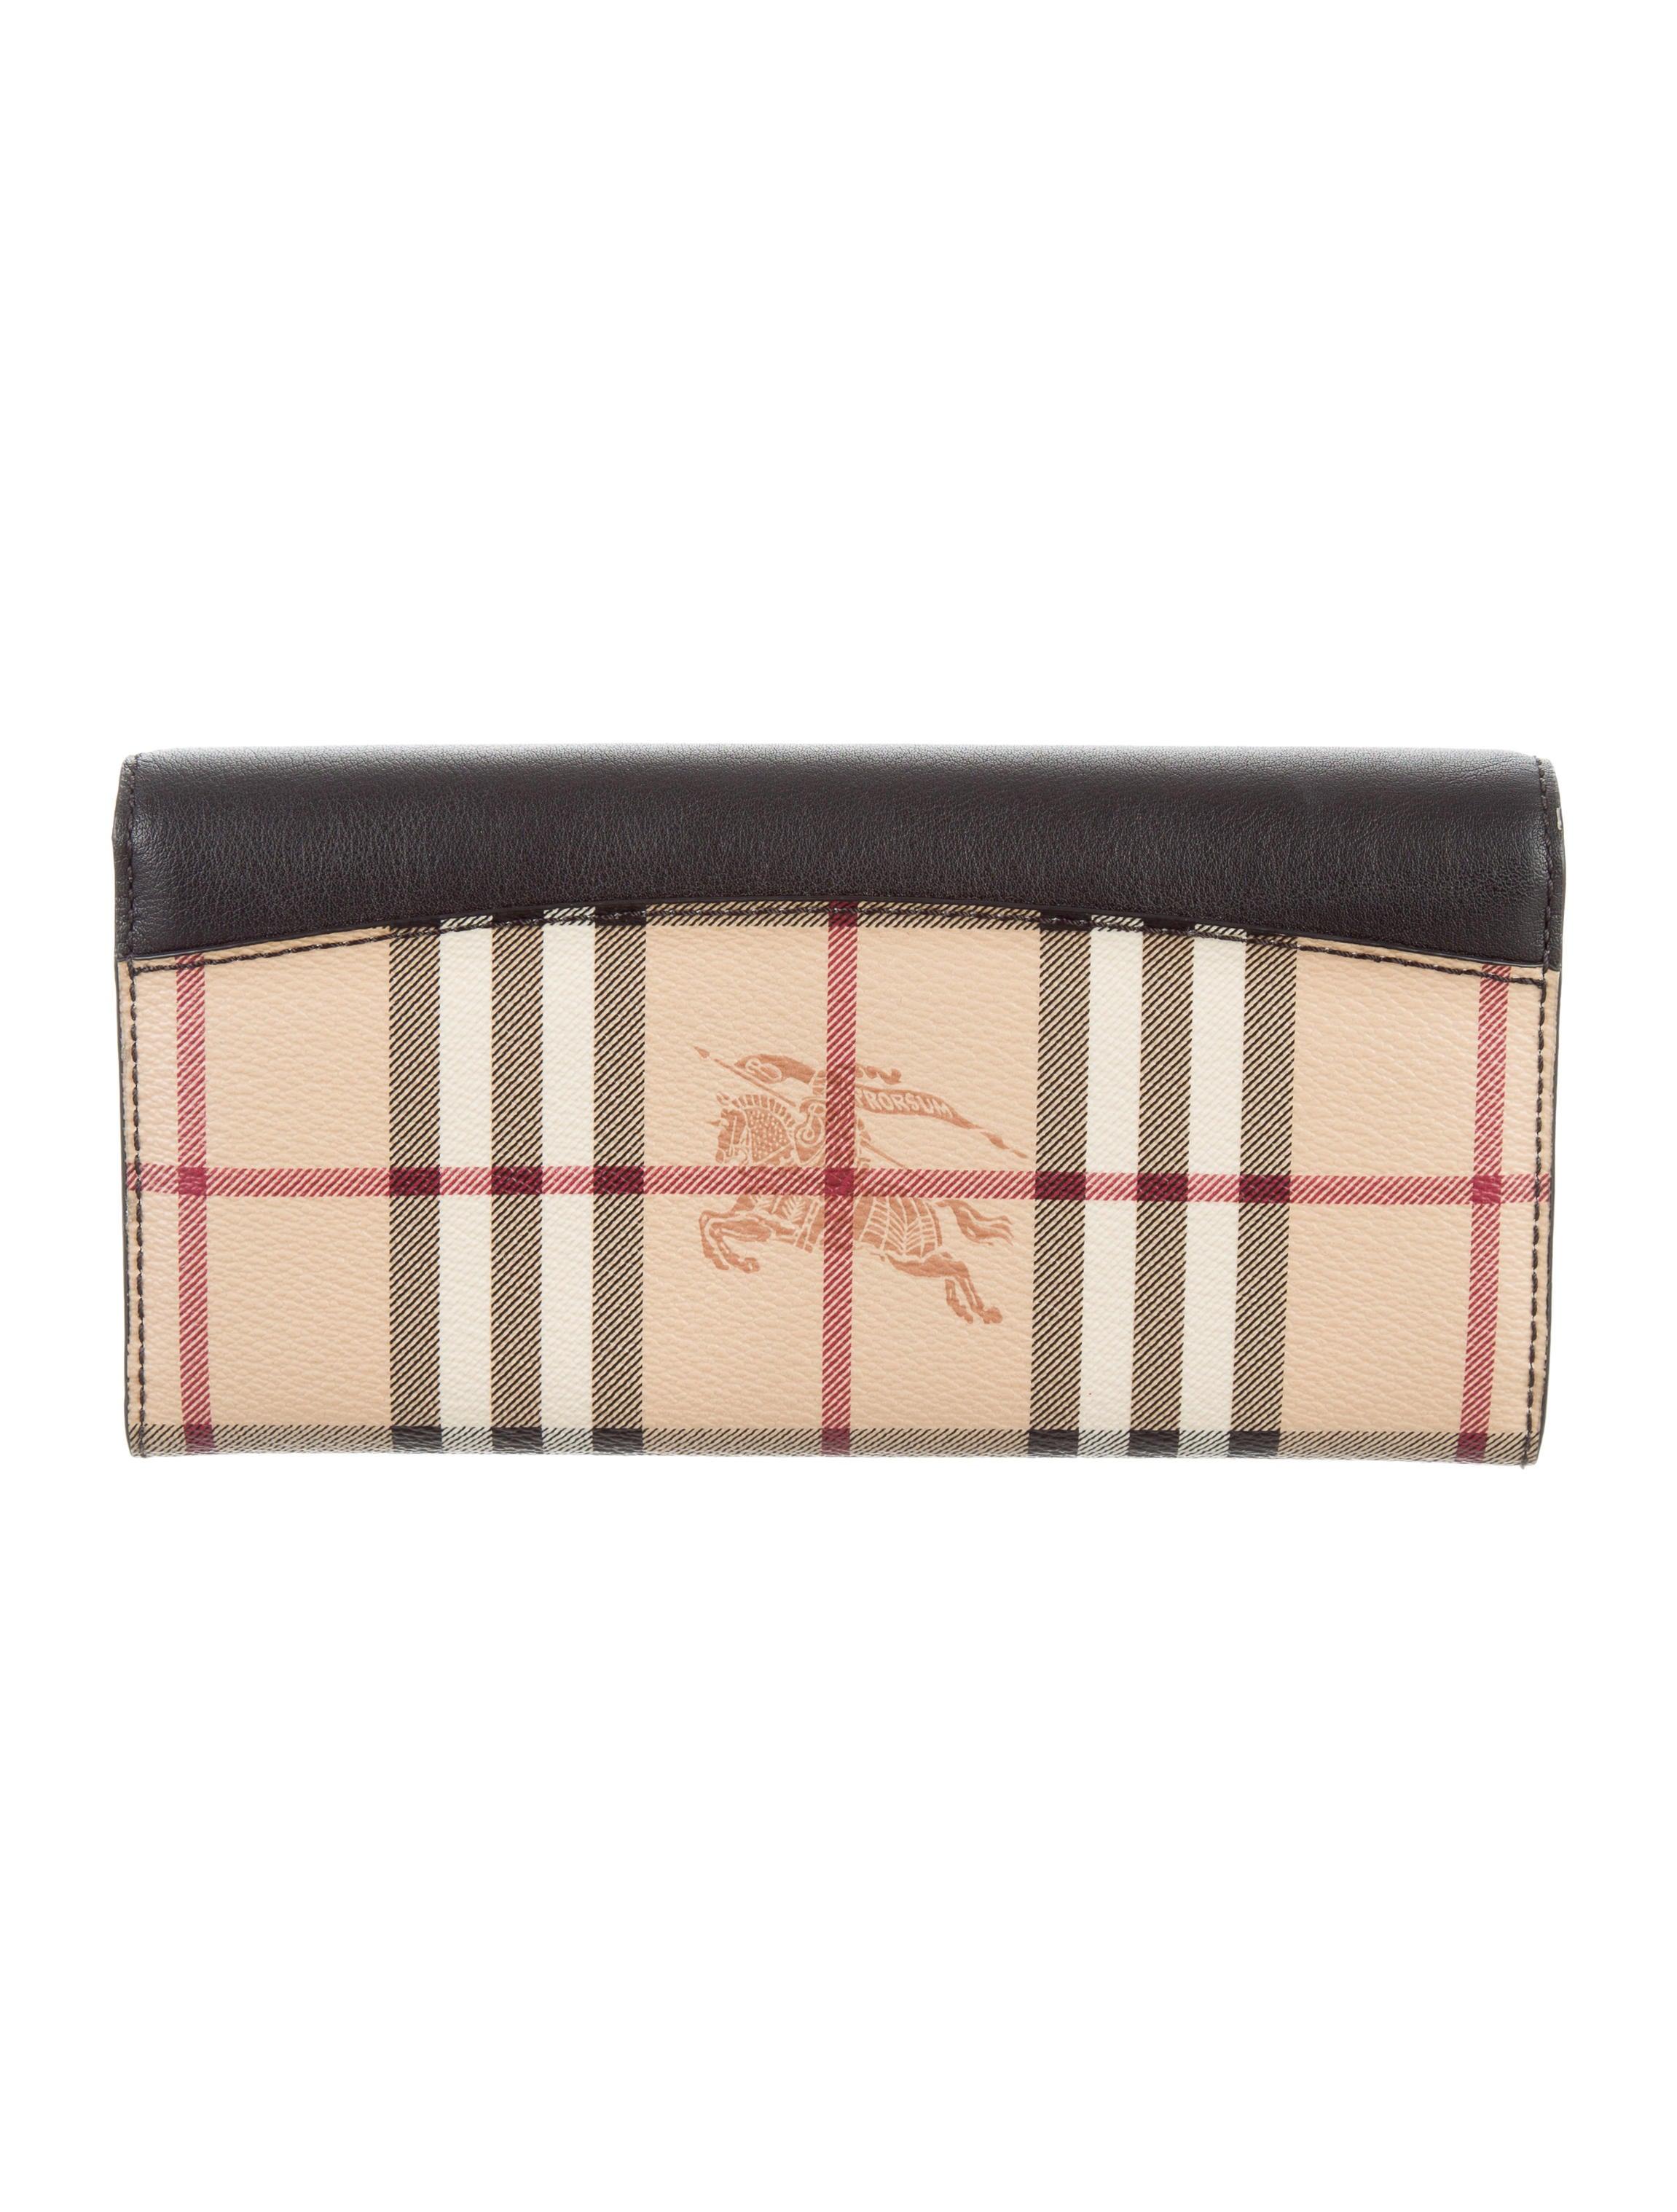 Burberry Nova Check Continental Wallet Accessories